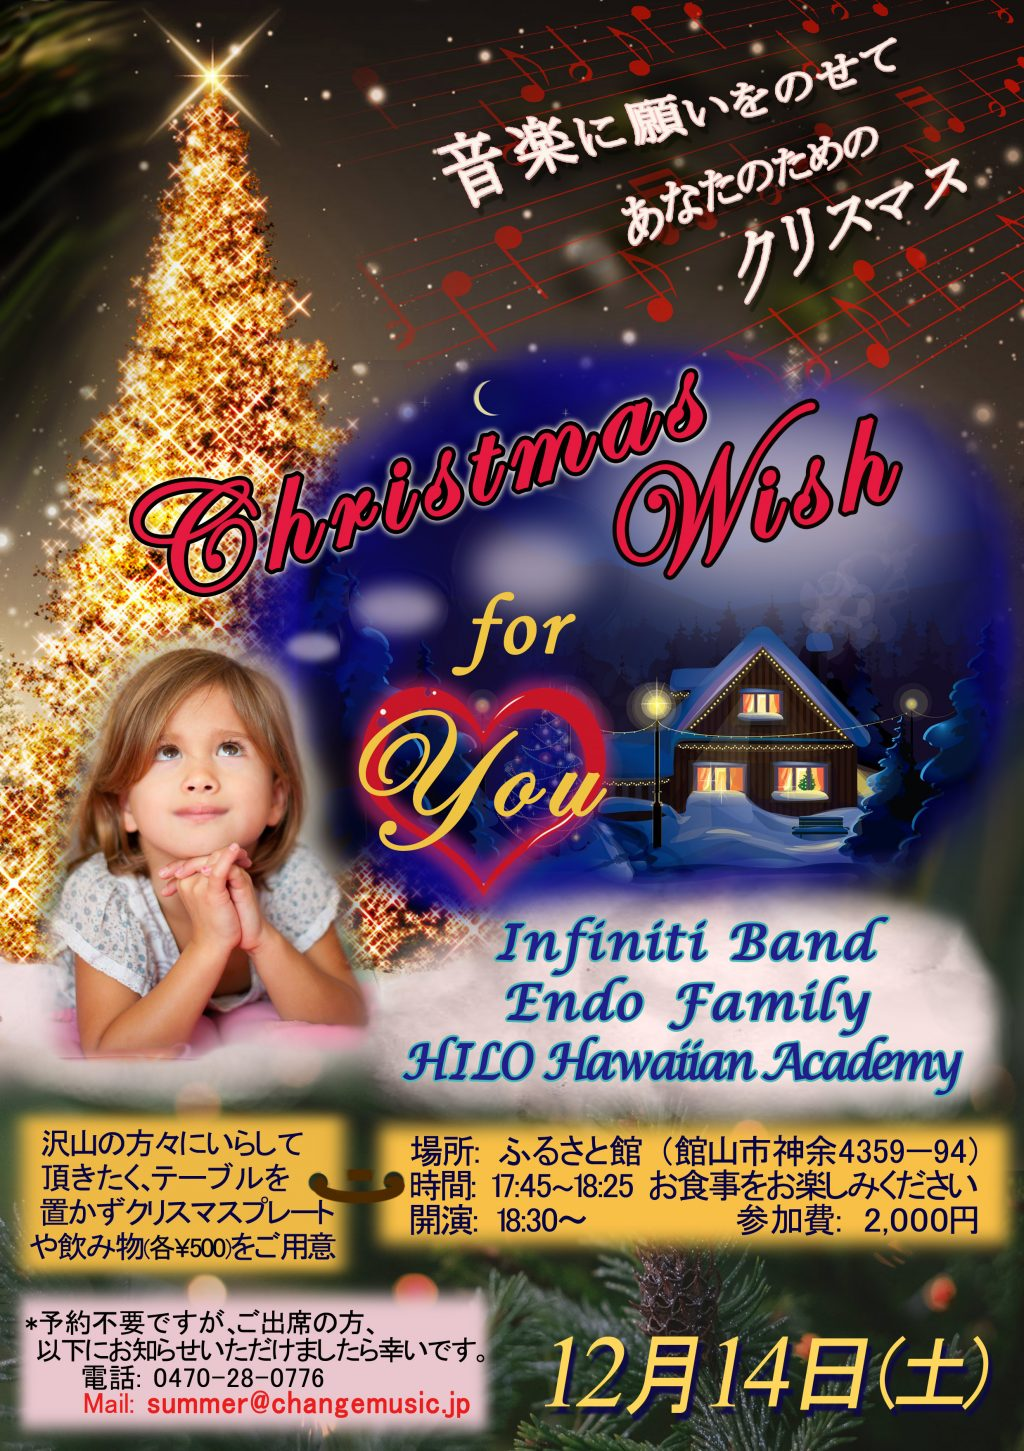 ChristmasWish2019 (NoQR)